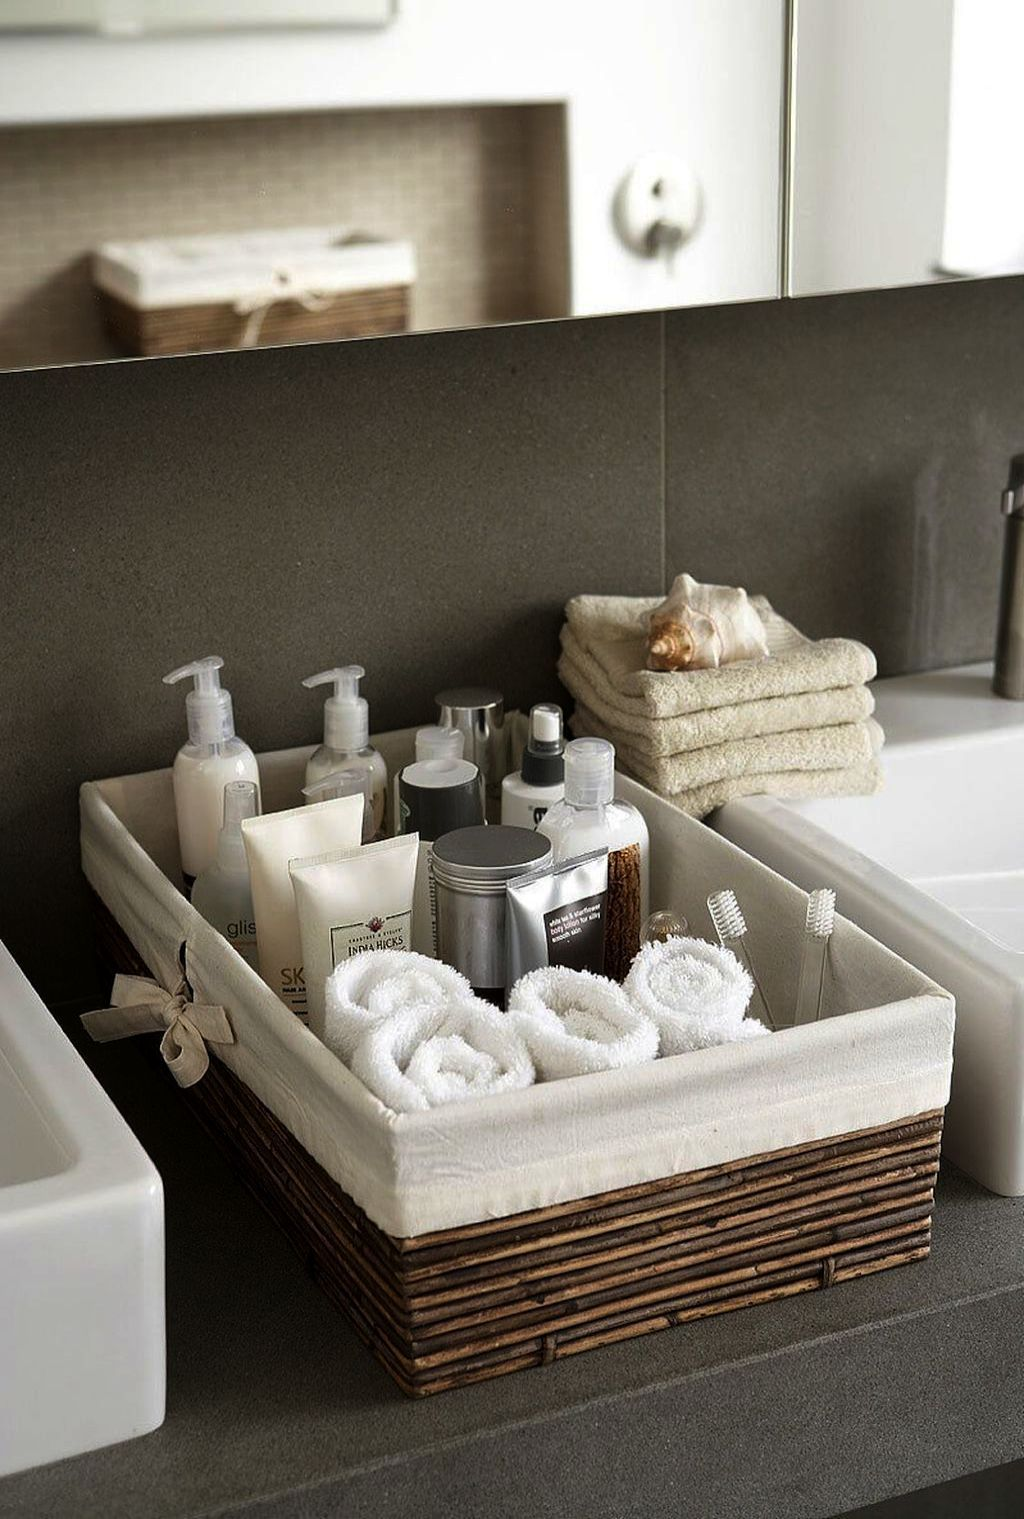 Awe Inspiring Black Bathroom Decor Pinterest Across Bathroom Vanities Caraccident5 Cool Chair Designs And Ideas Caraccident5Info